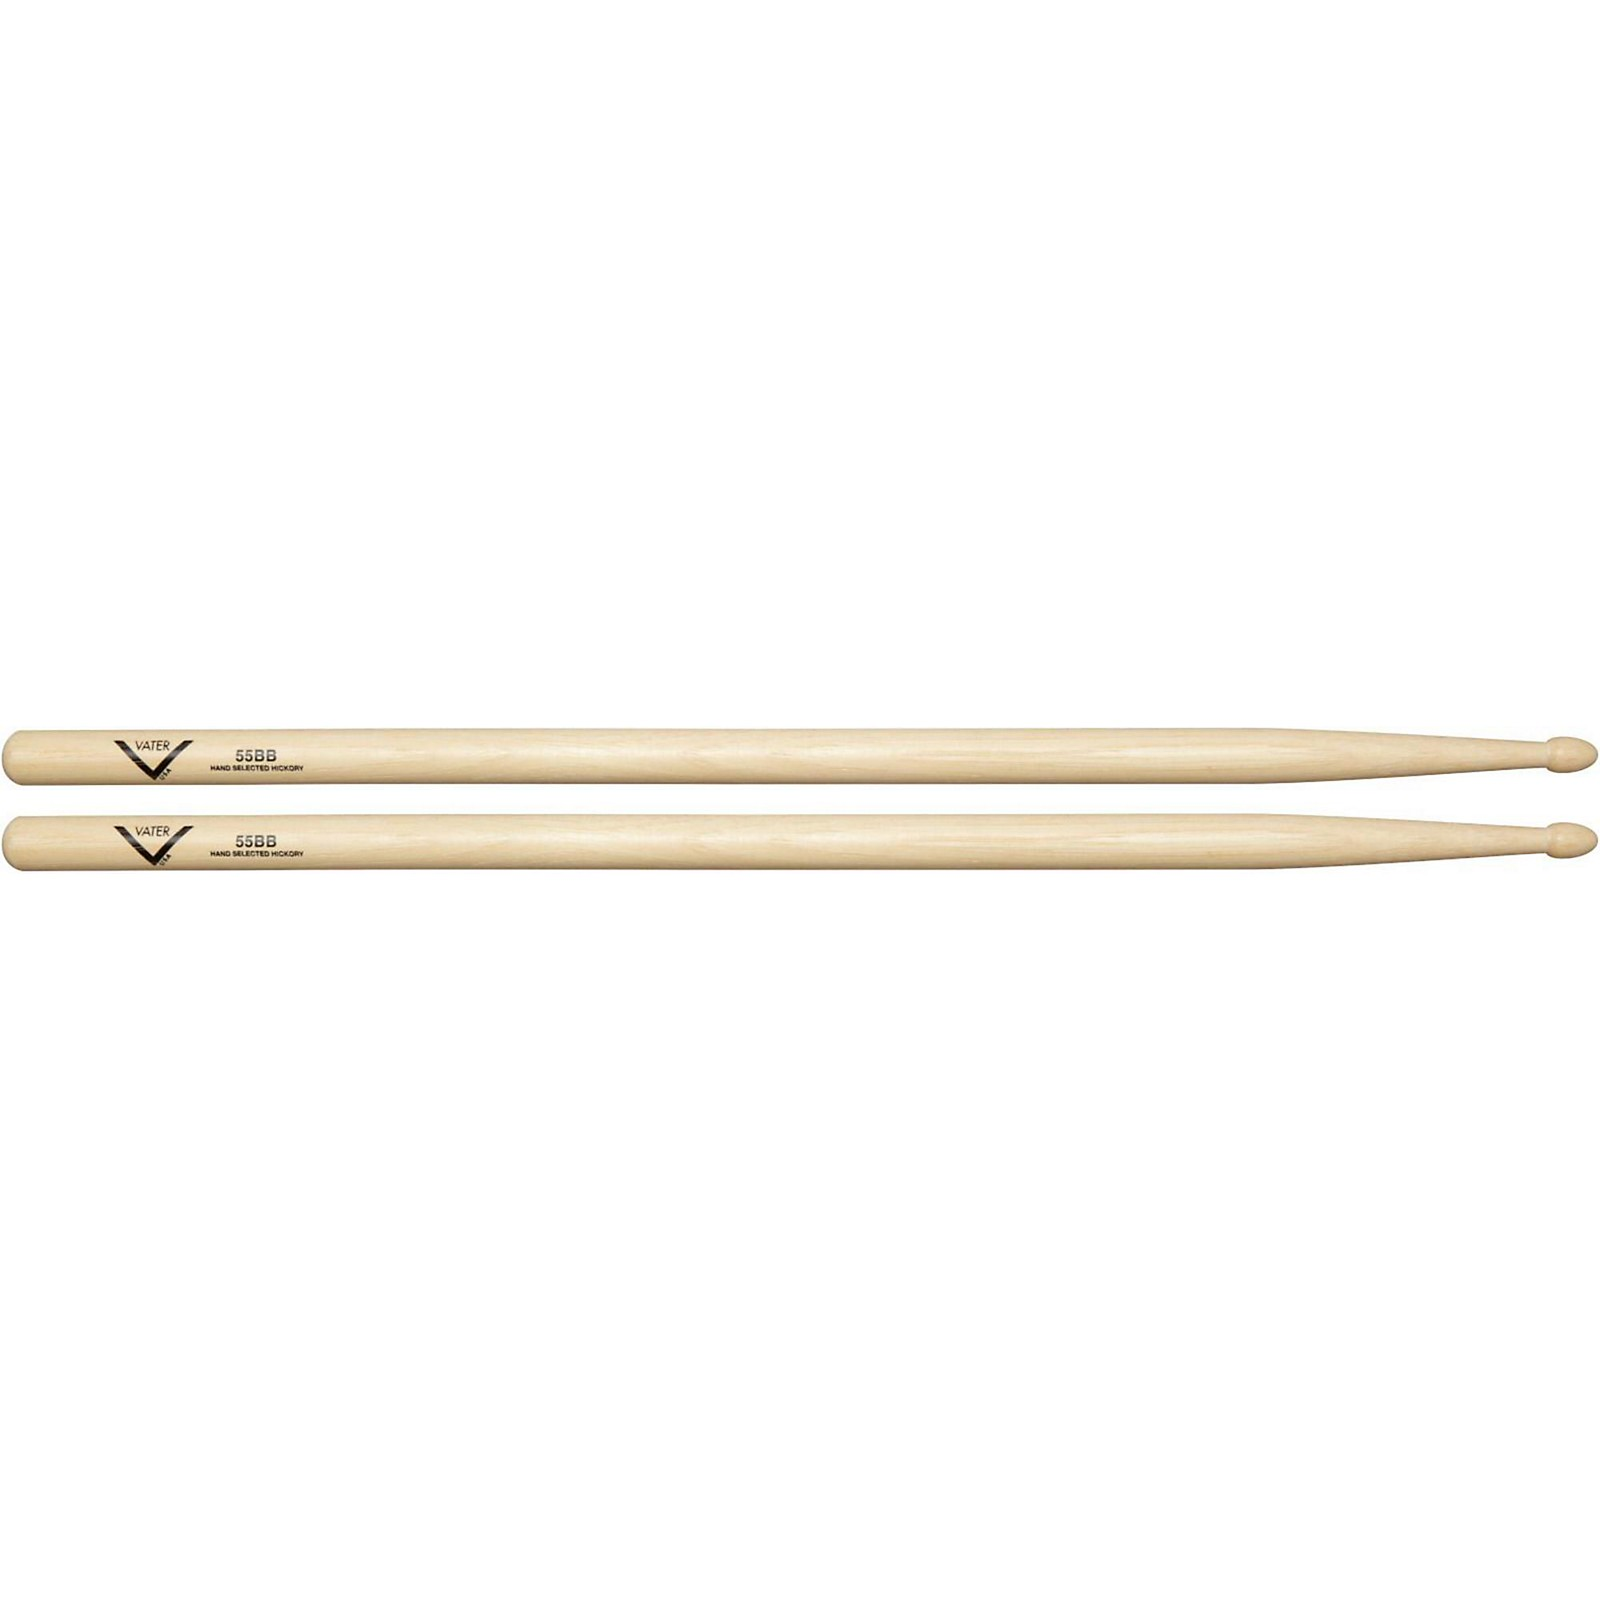 Vater American Hickory 55BB Drumsticks